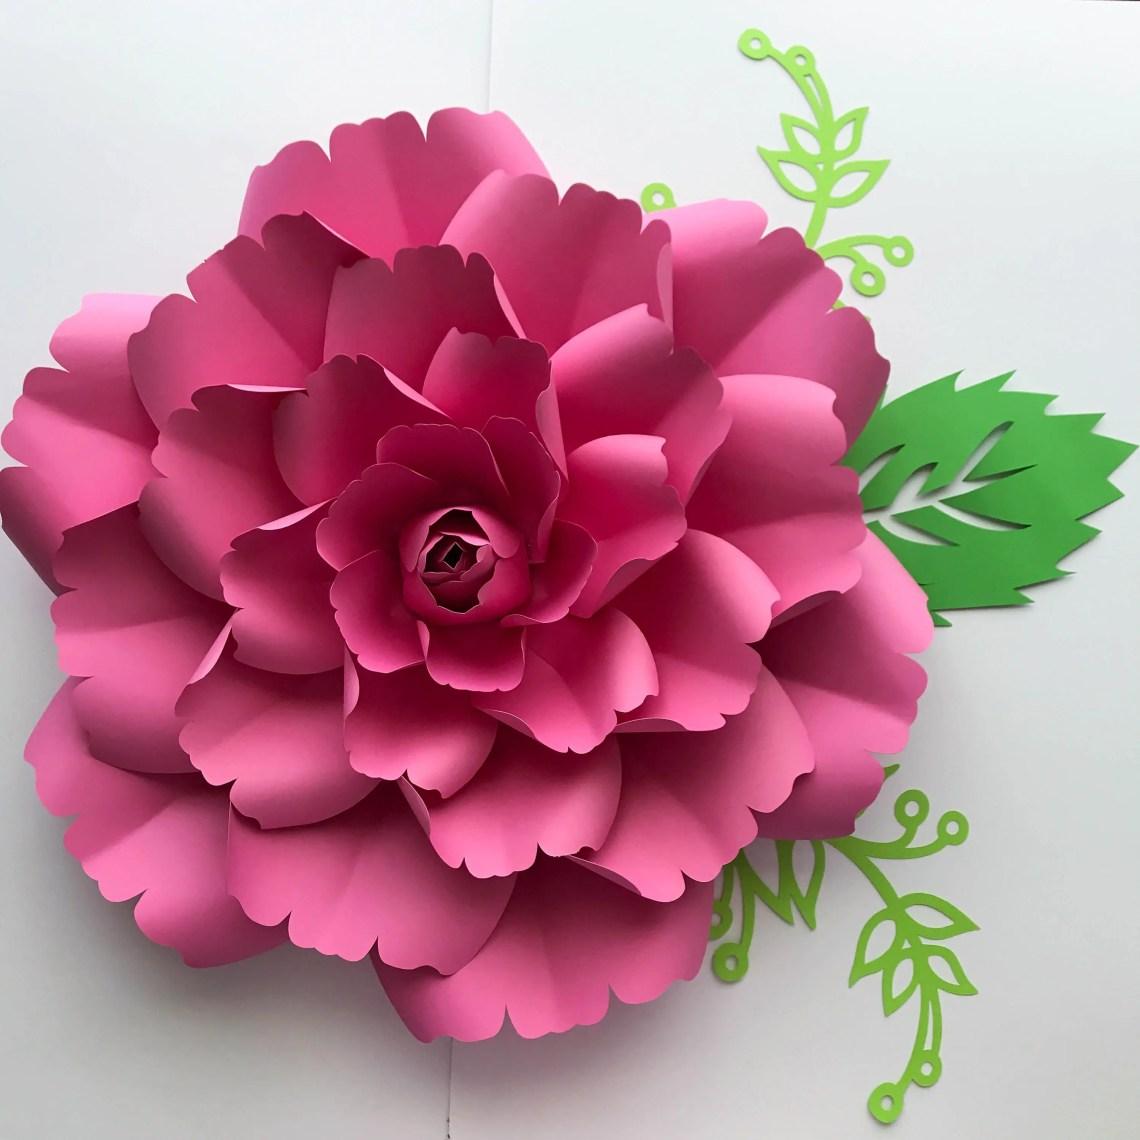 Download SVG Petal 137 Paper Flower template with Center Digital